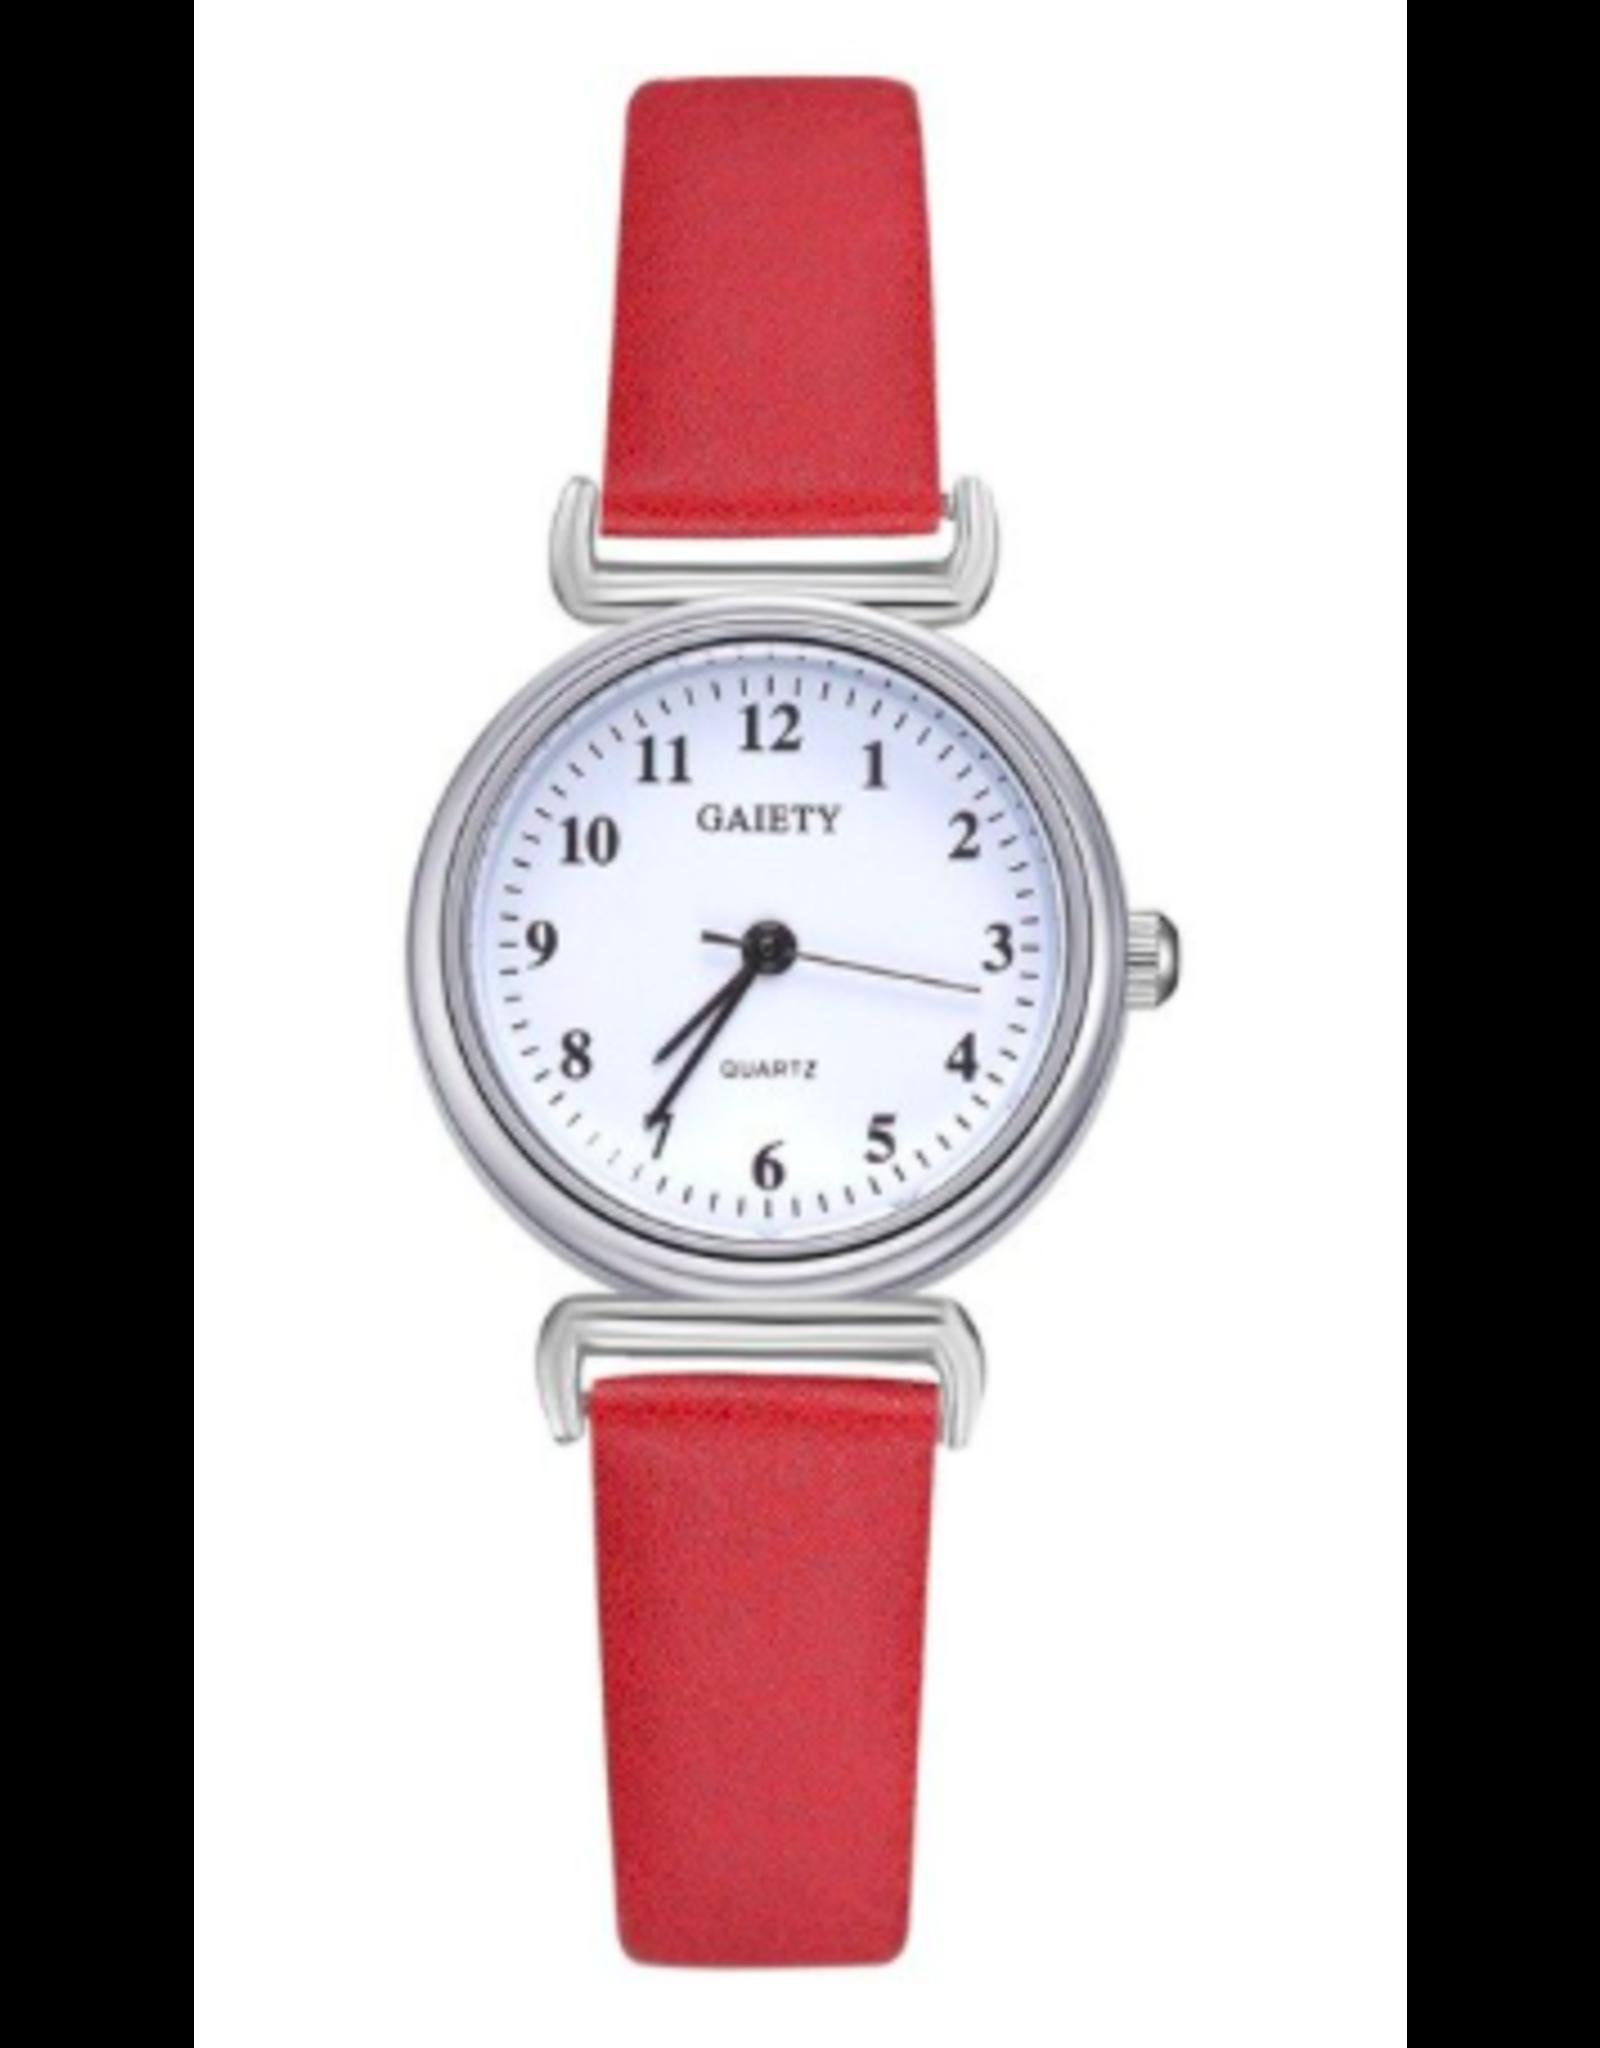 Gaiety Gaiety ronde  bracelet rouge